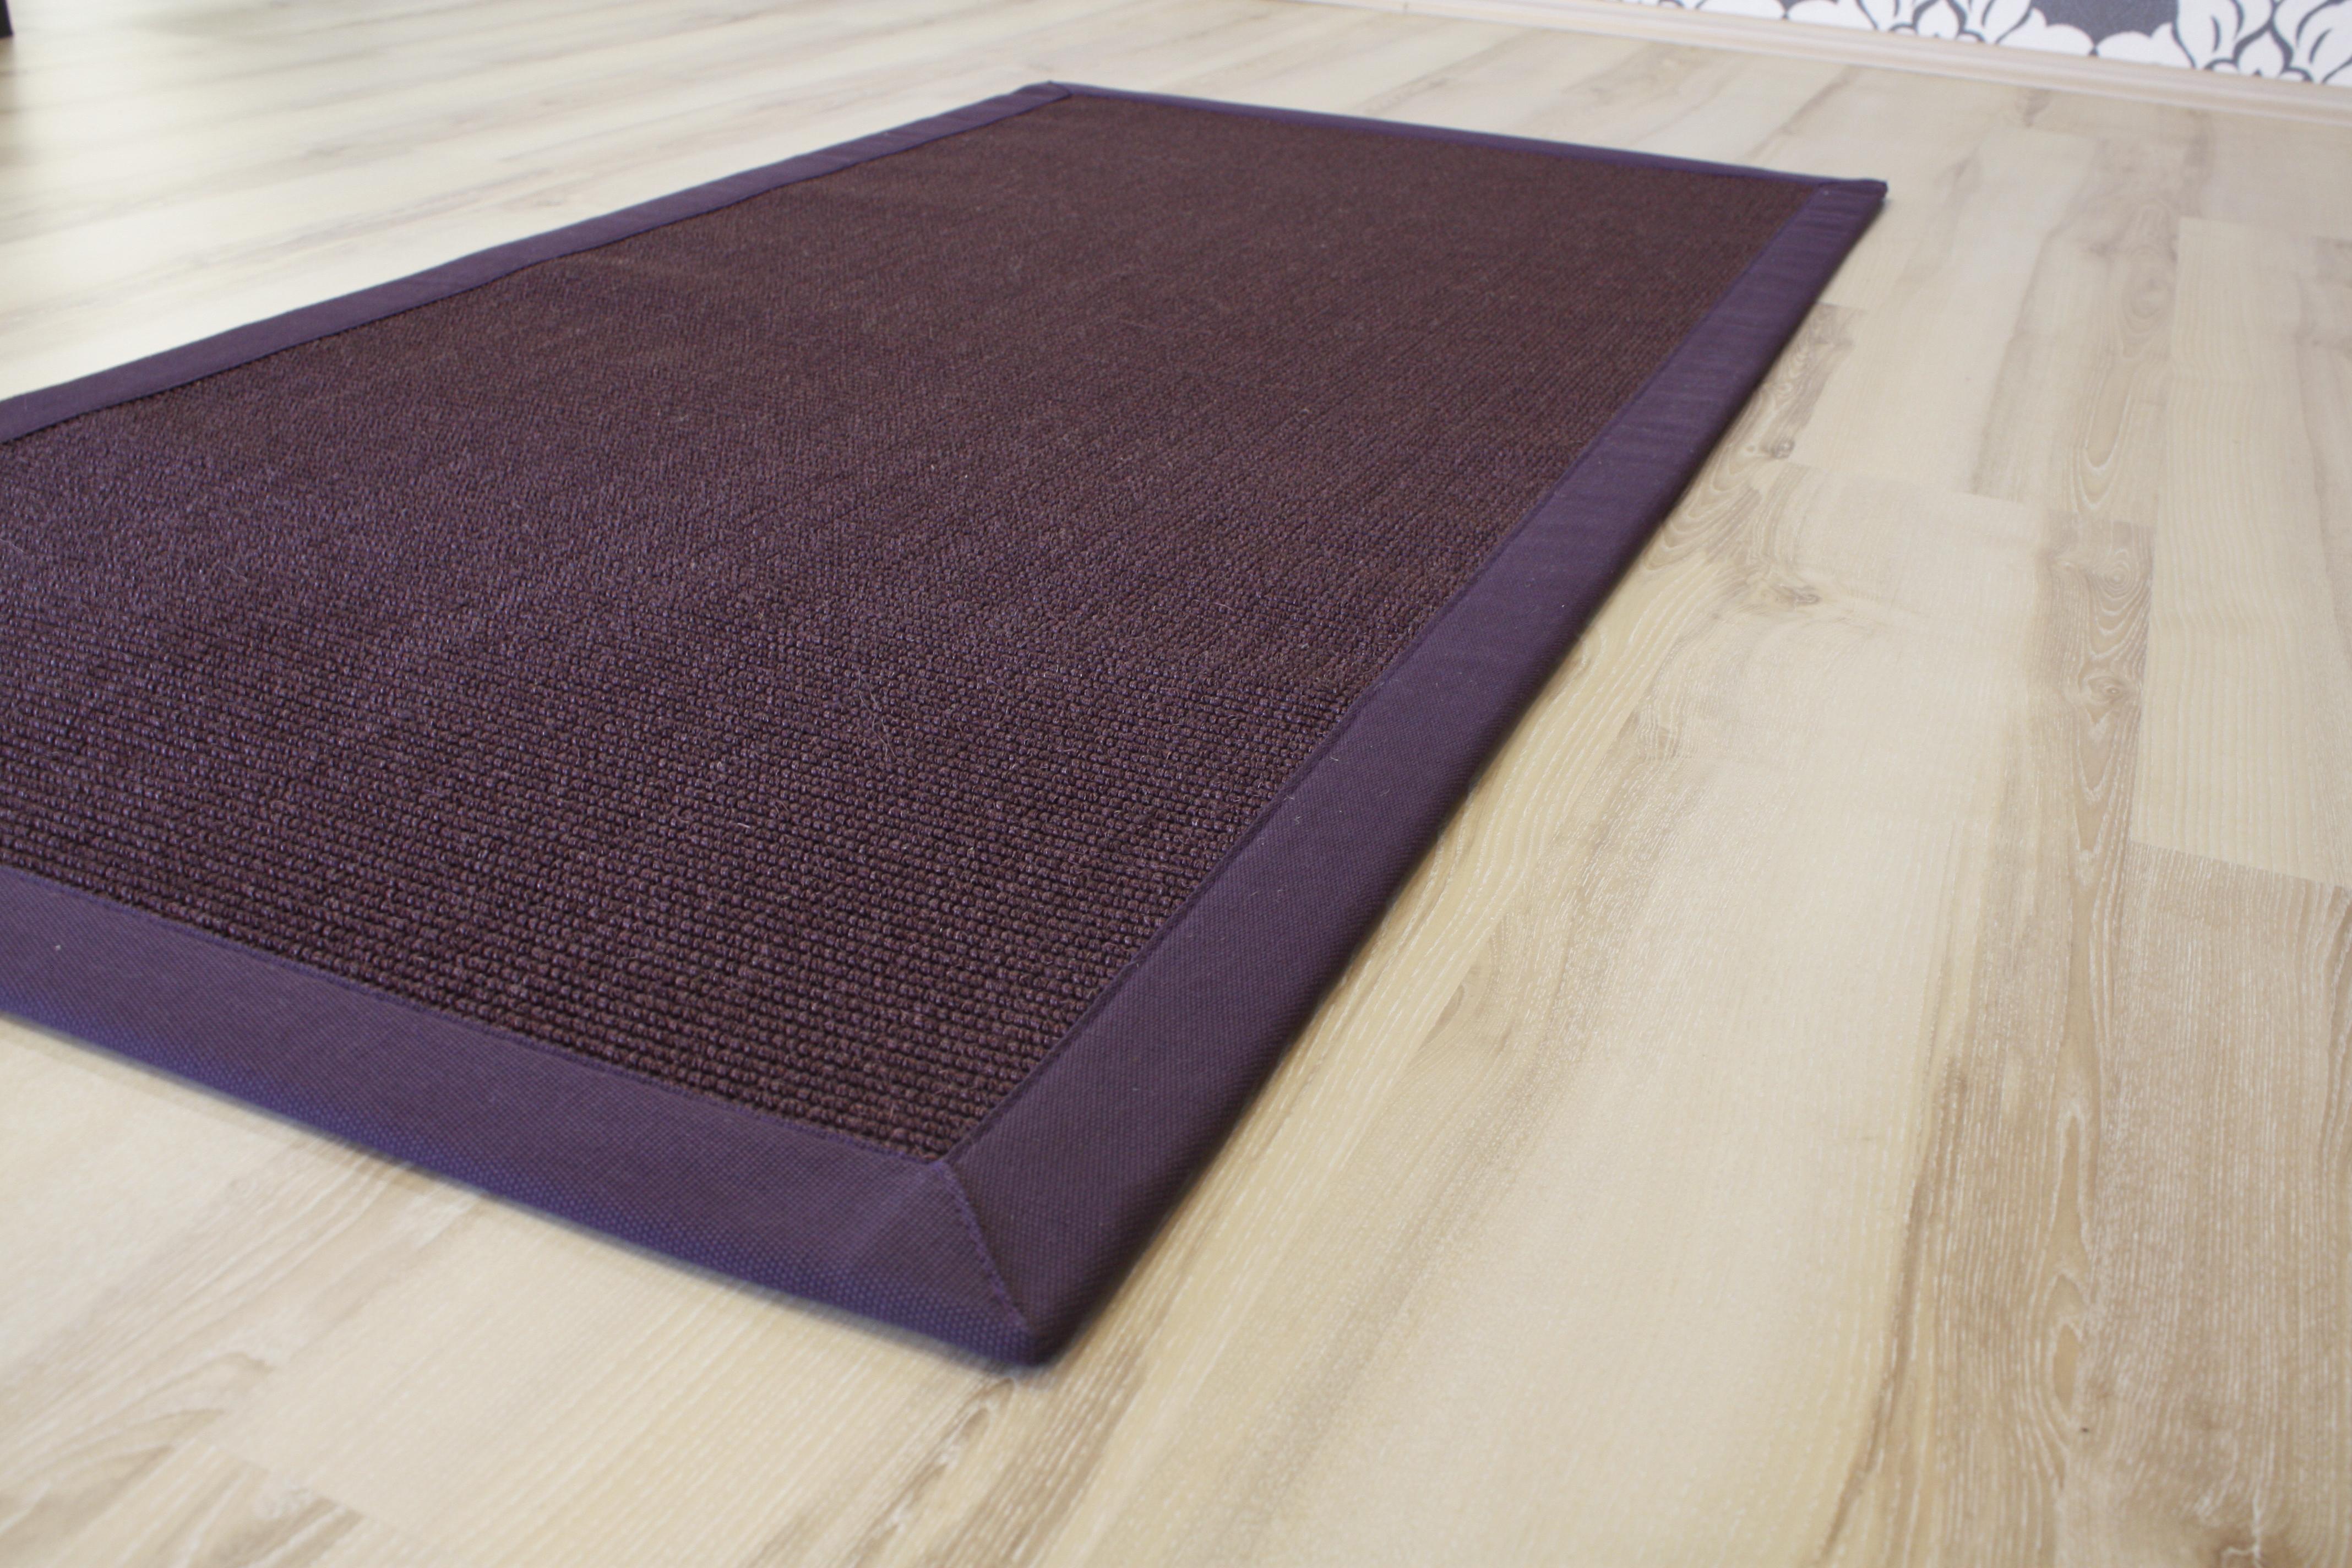 Tapis en sisal tapis bordures aubergine 200x250cm mauve - Tapis en sisal ...